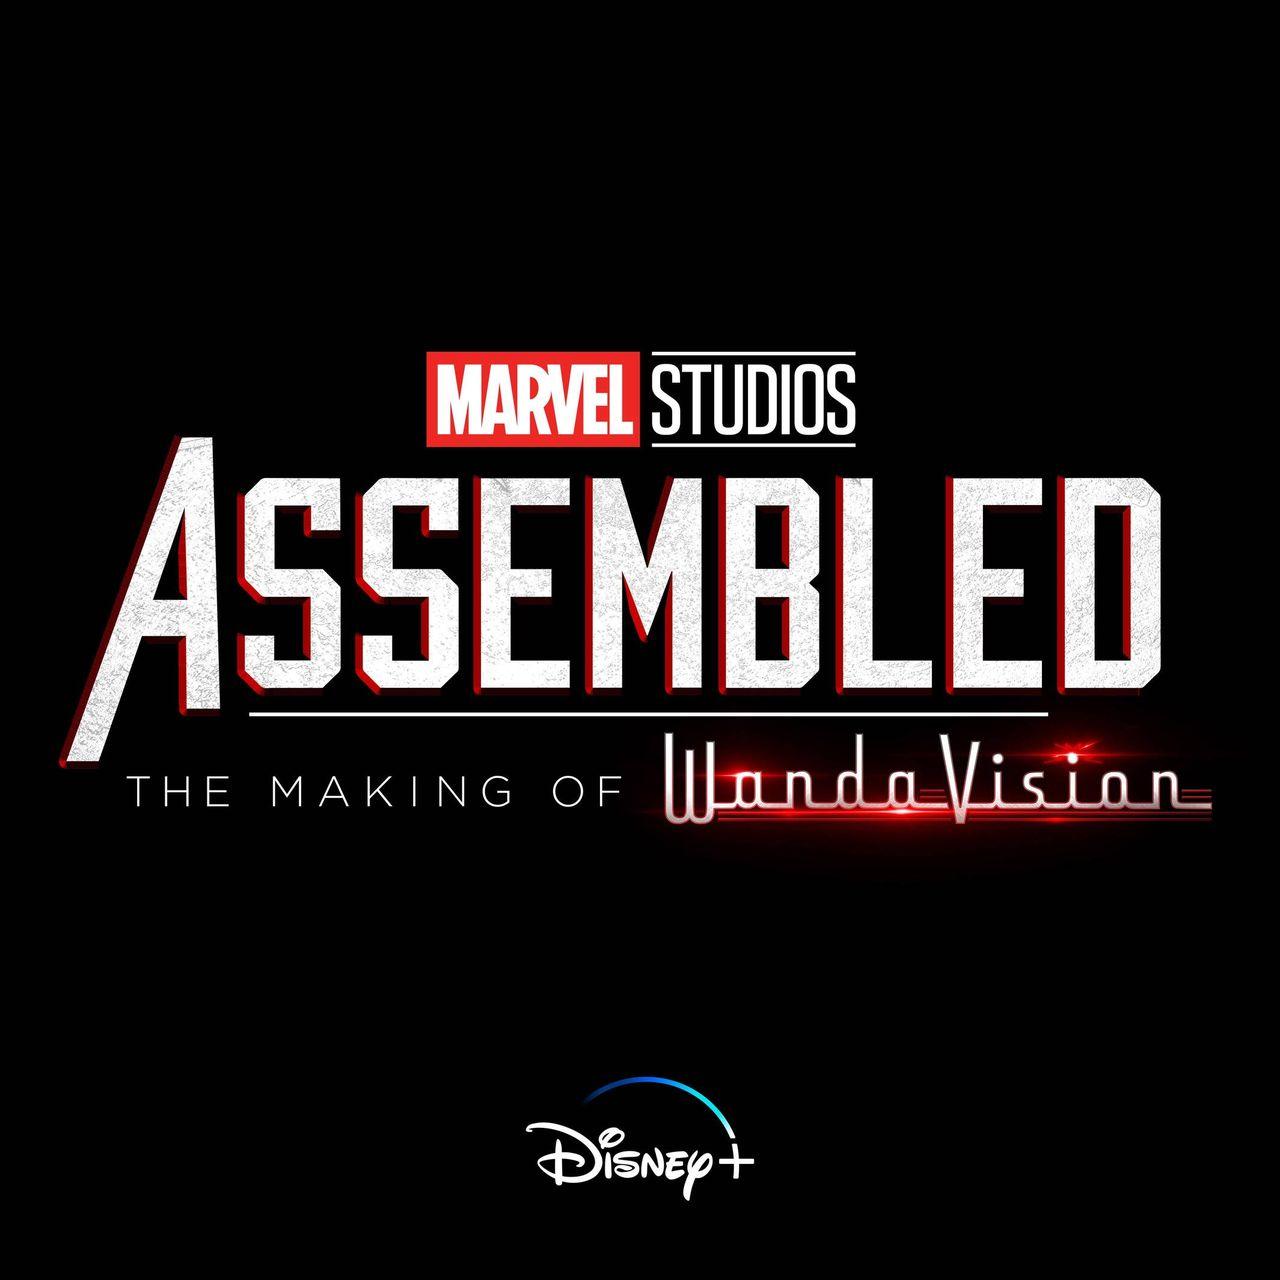 Marvel Studios Assembled ger oss en titt bakom kulisserna